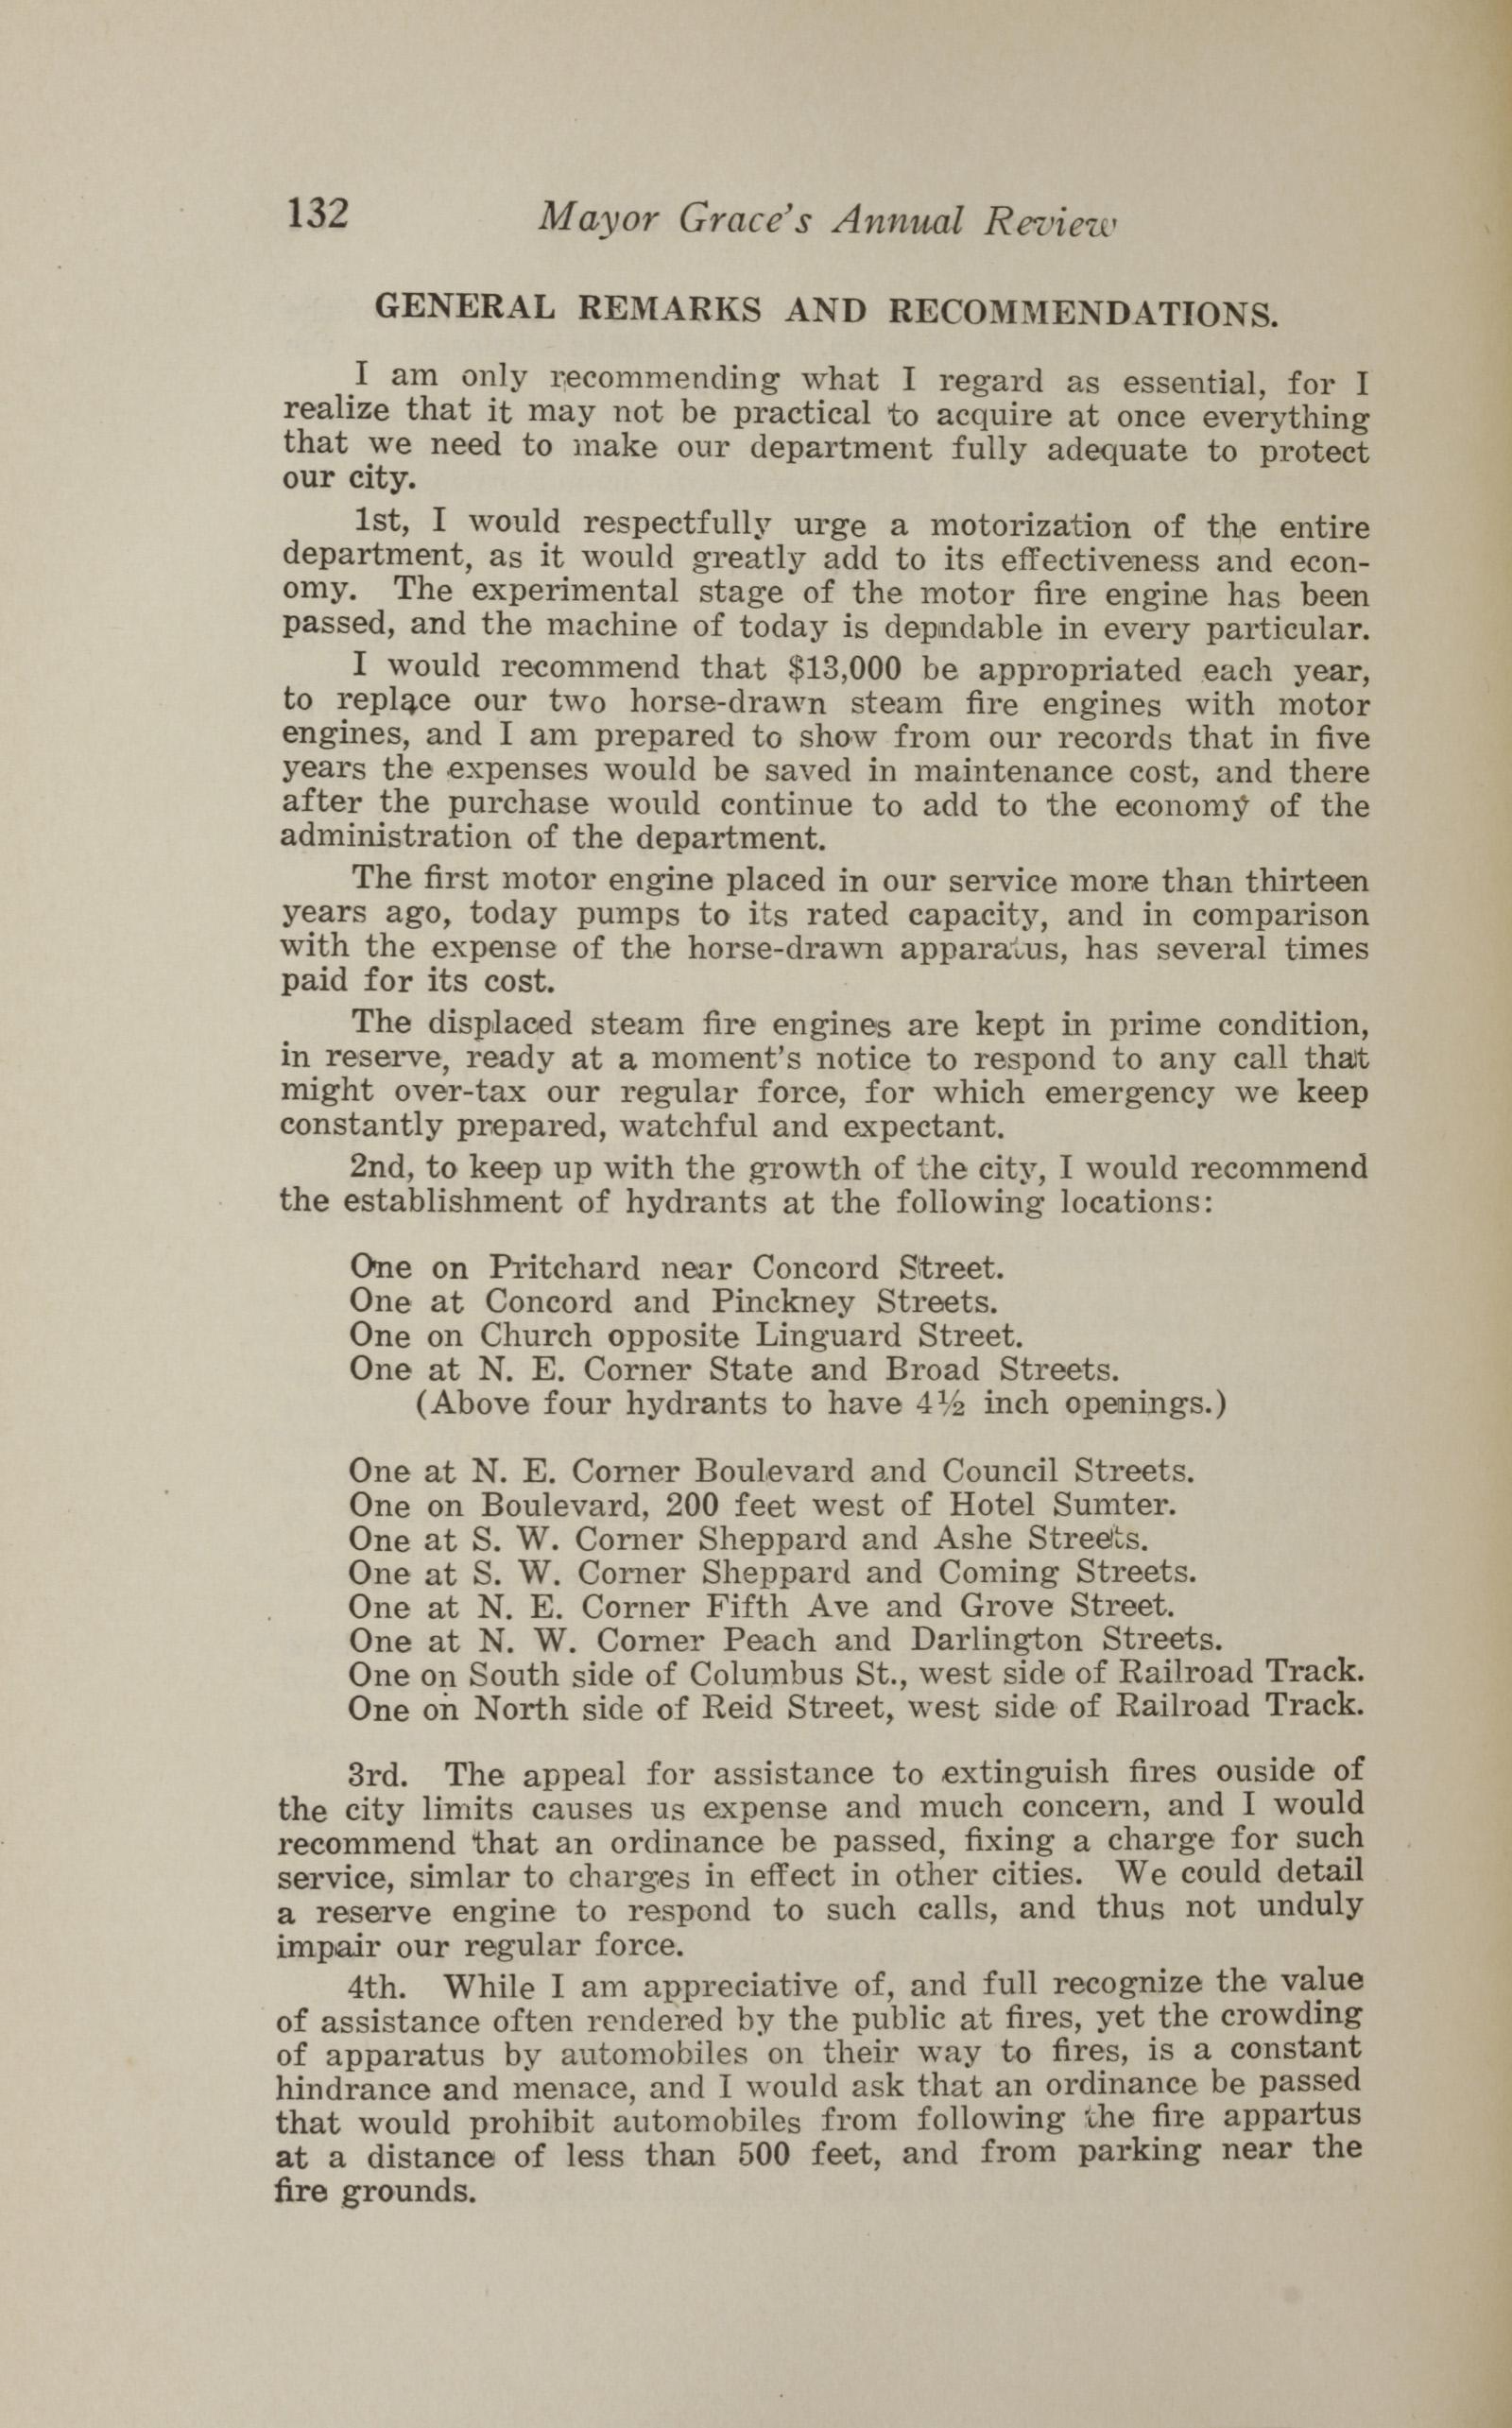 Charleston Yearbook, 1923, page 132